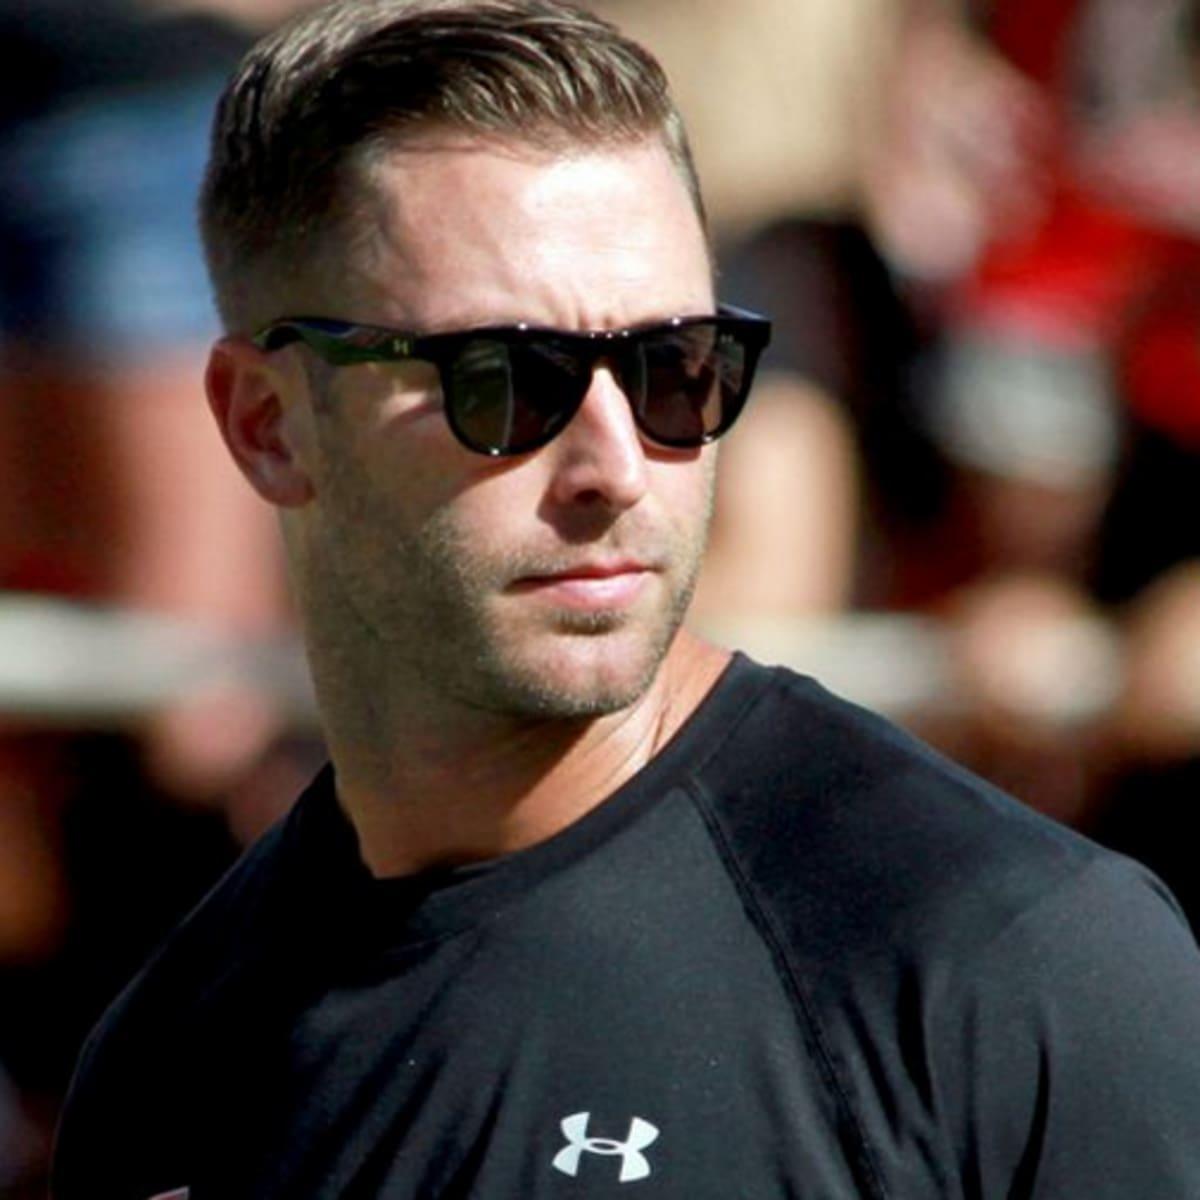 Houston, hottest college football coach in Texas, August 2015, Kliff Kingsbury